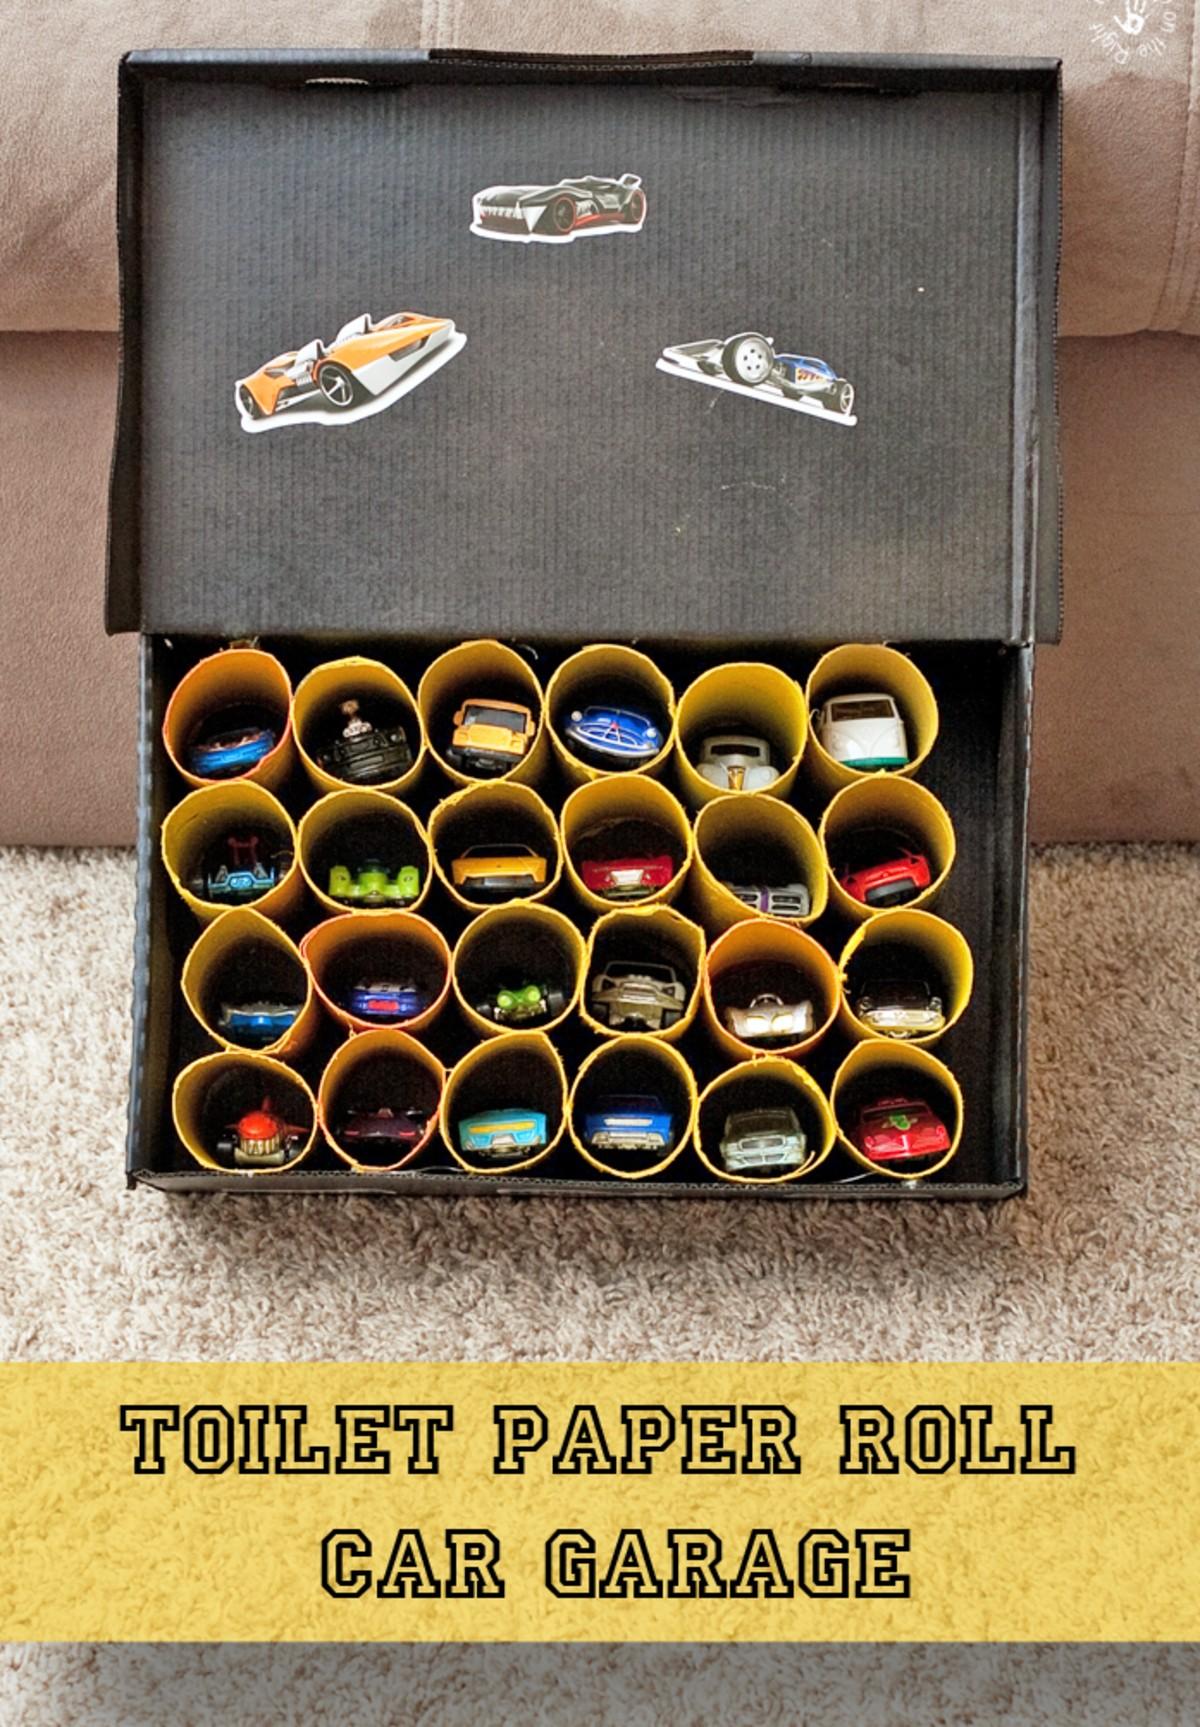 Toilet Roll Car Garage